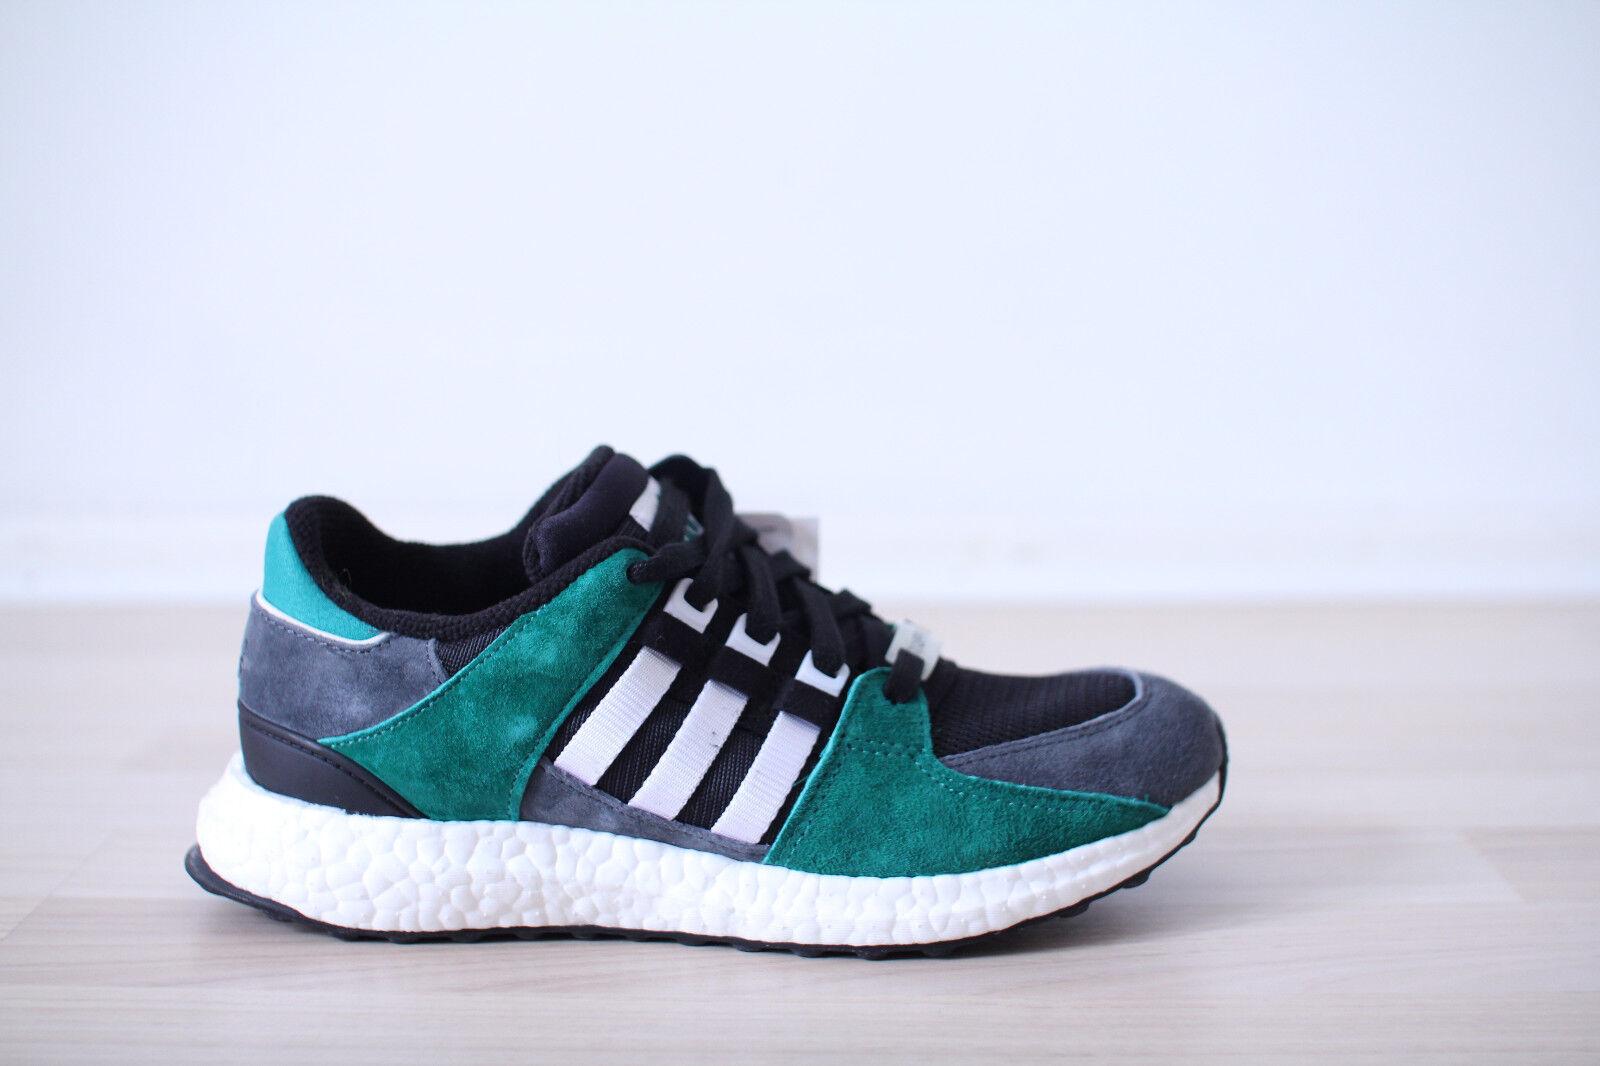 Adidas equipment support 93 16 OG VERT BLANC taille 37,38,39 NOUVEAU & NEUF dans sa boîte Ultra Boost